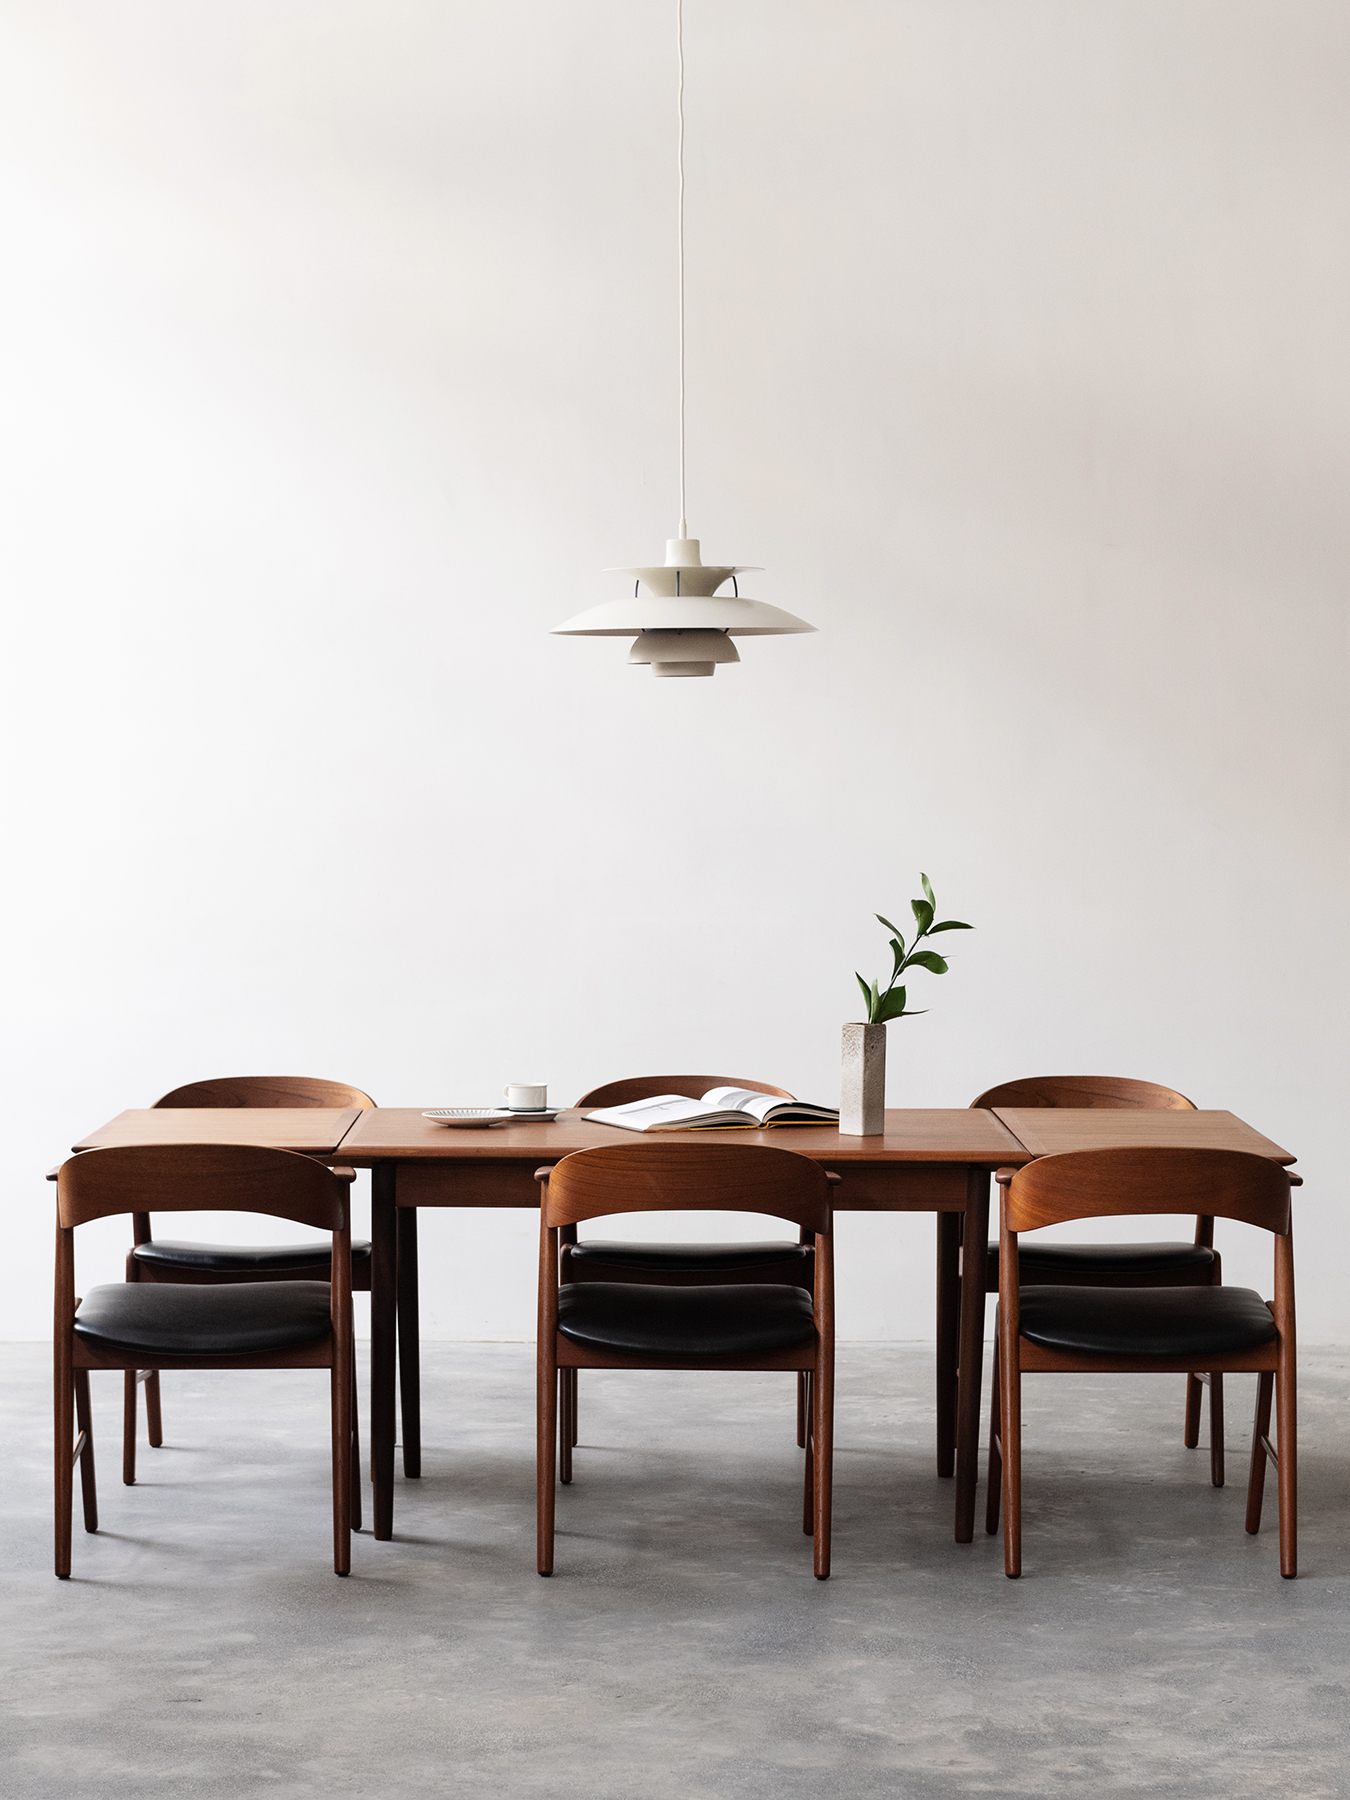 Sold Danish Dining Table Noden Original Vintage Scandinavian Furniture Singapore